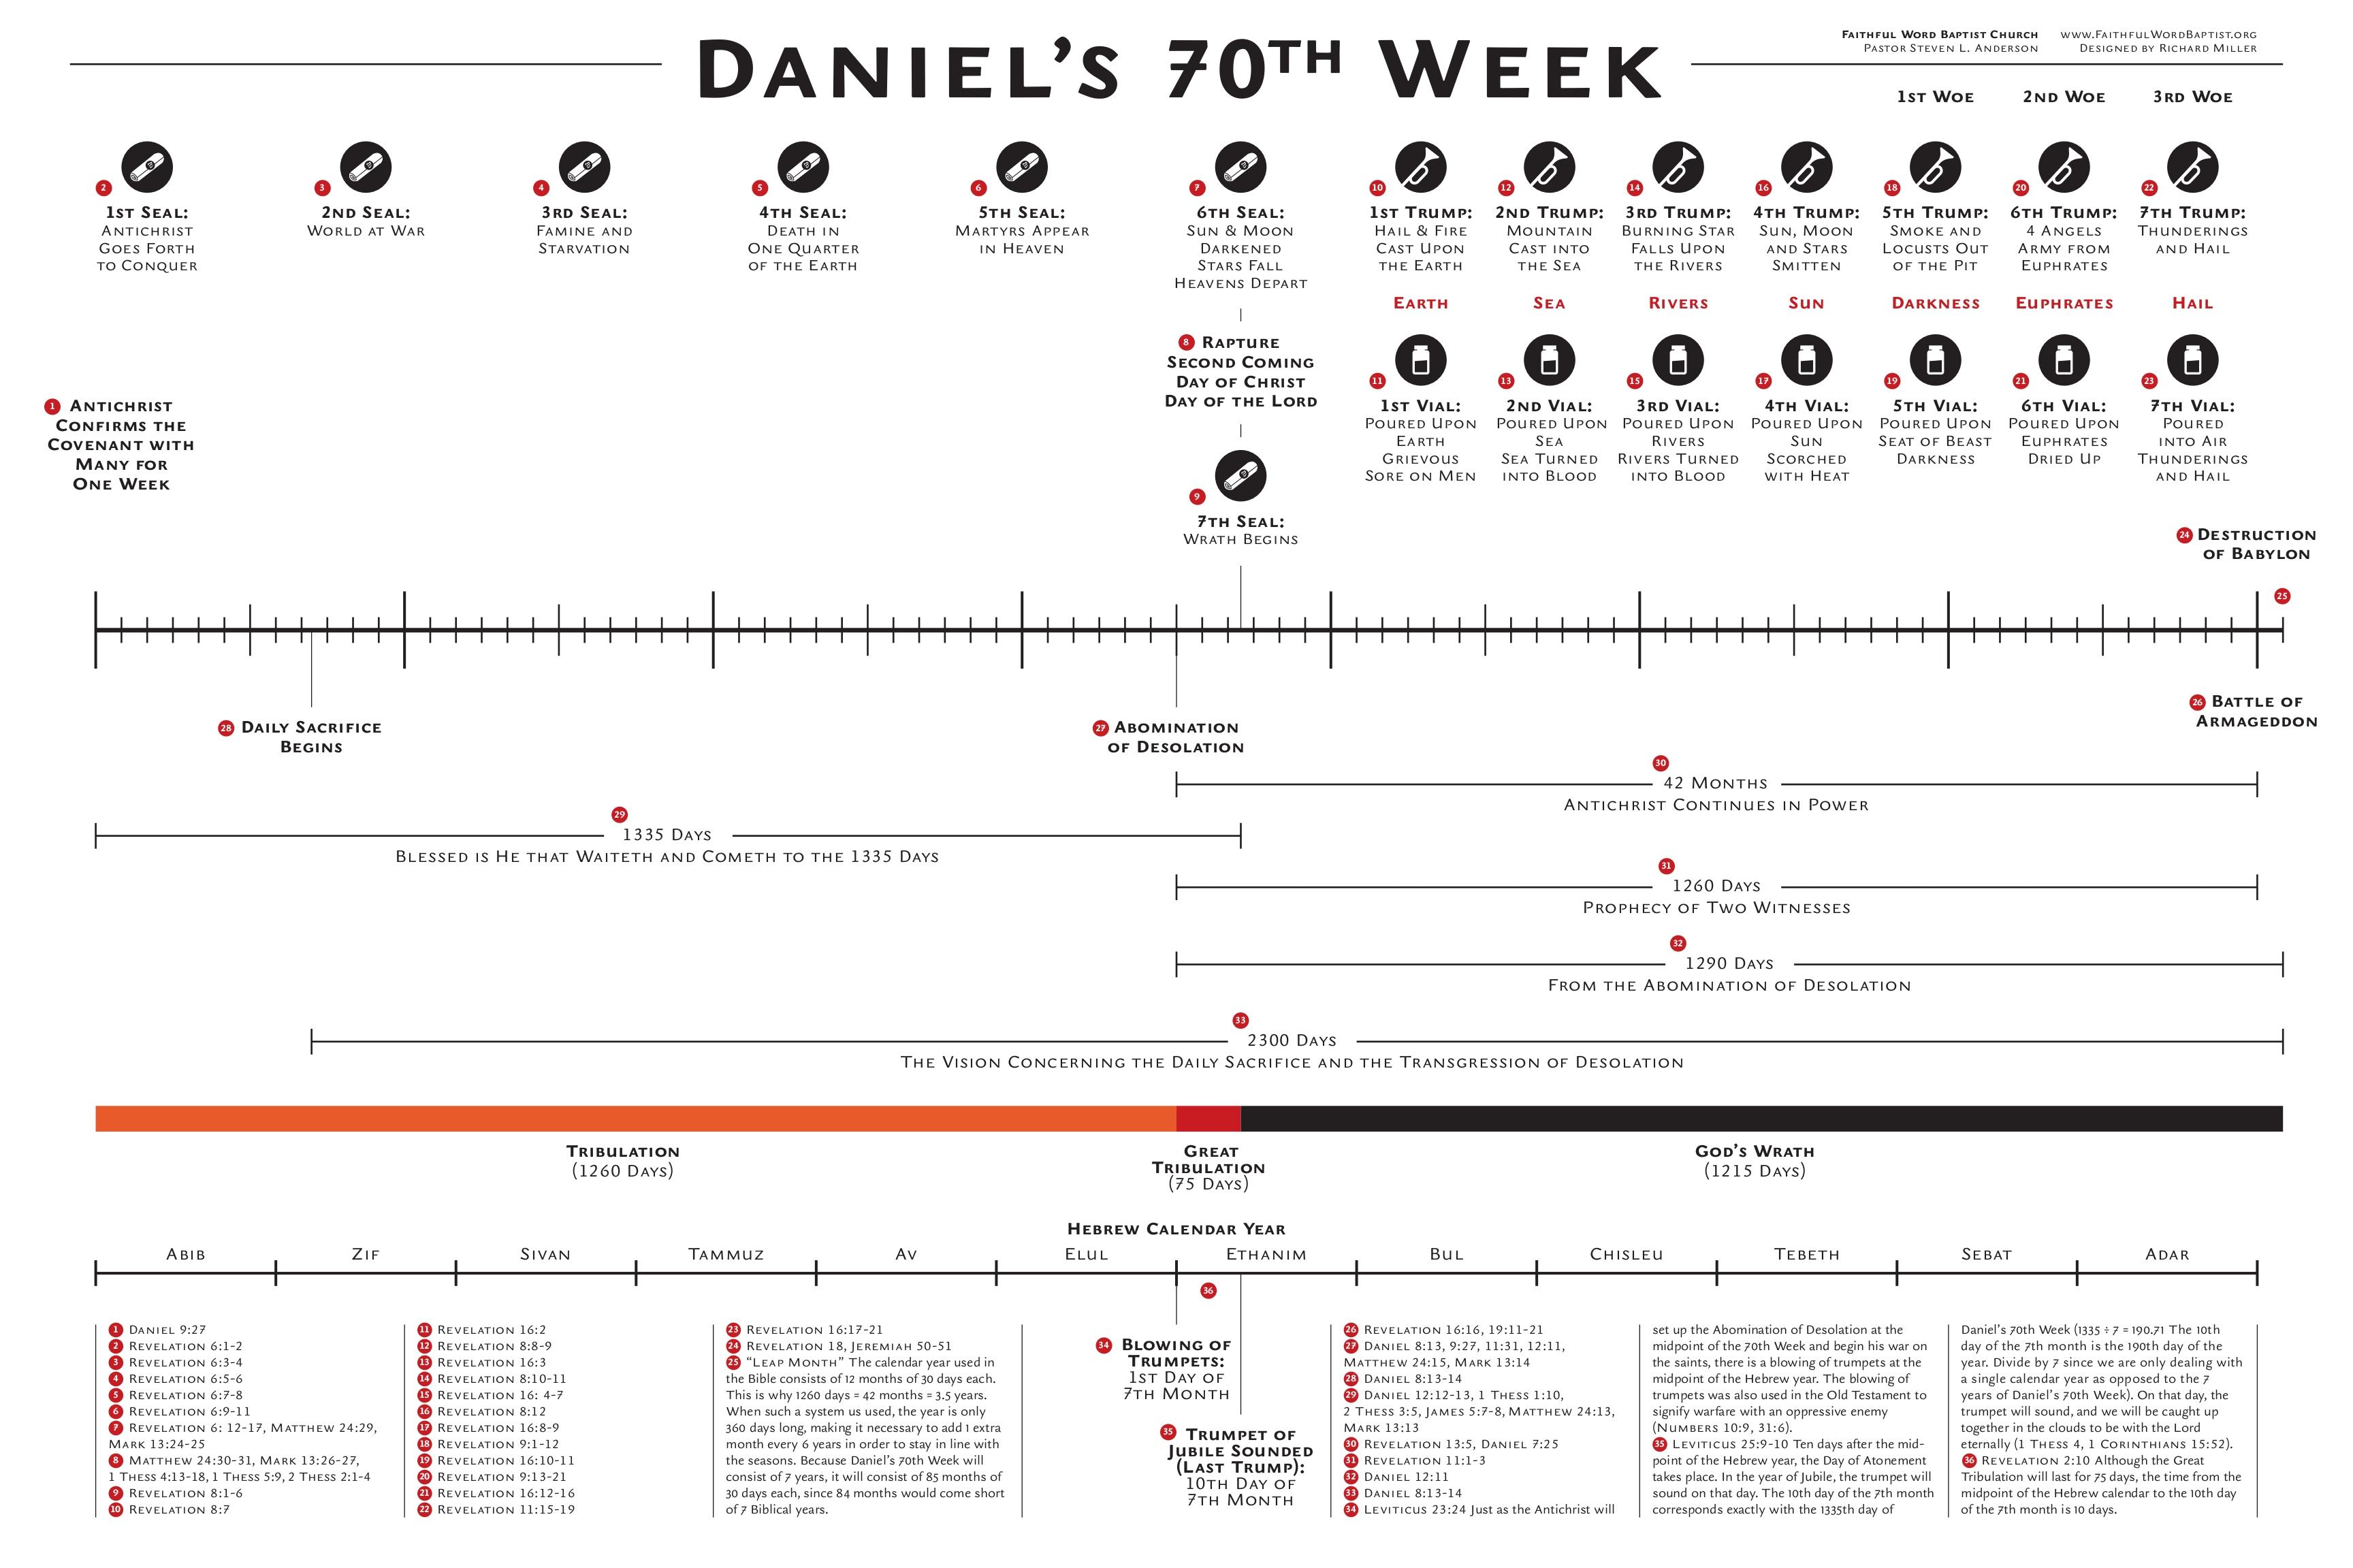 daniels_70th_week_chart